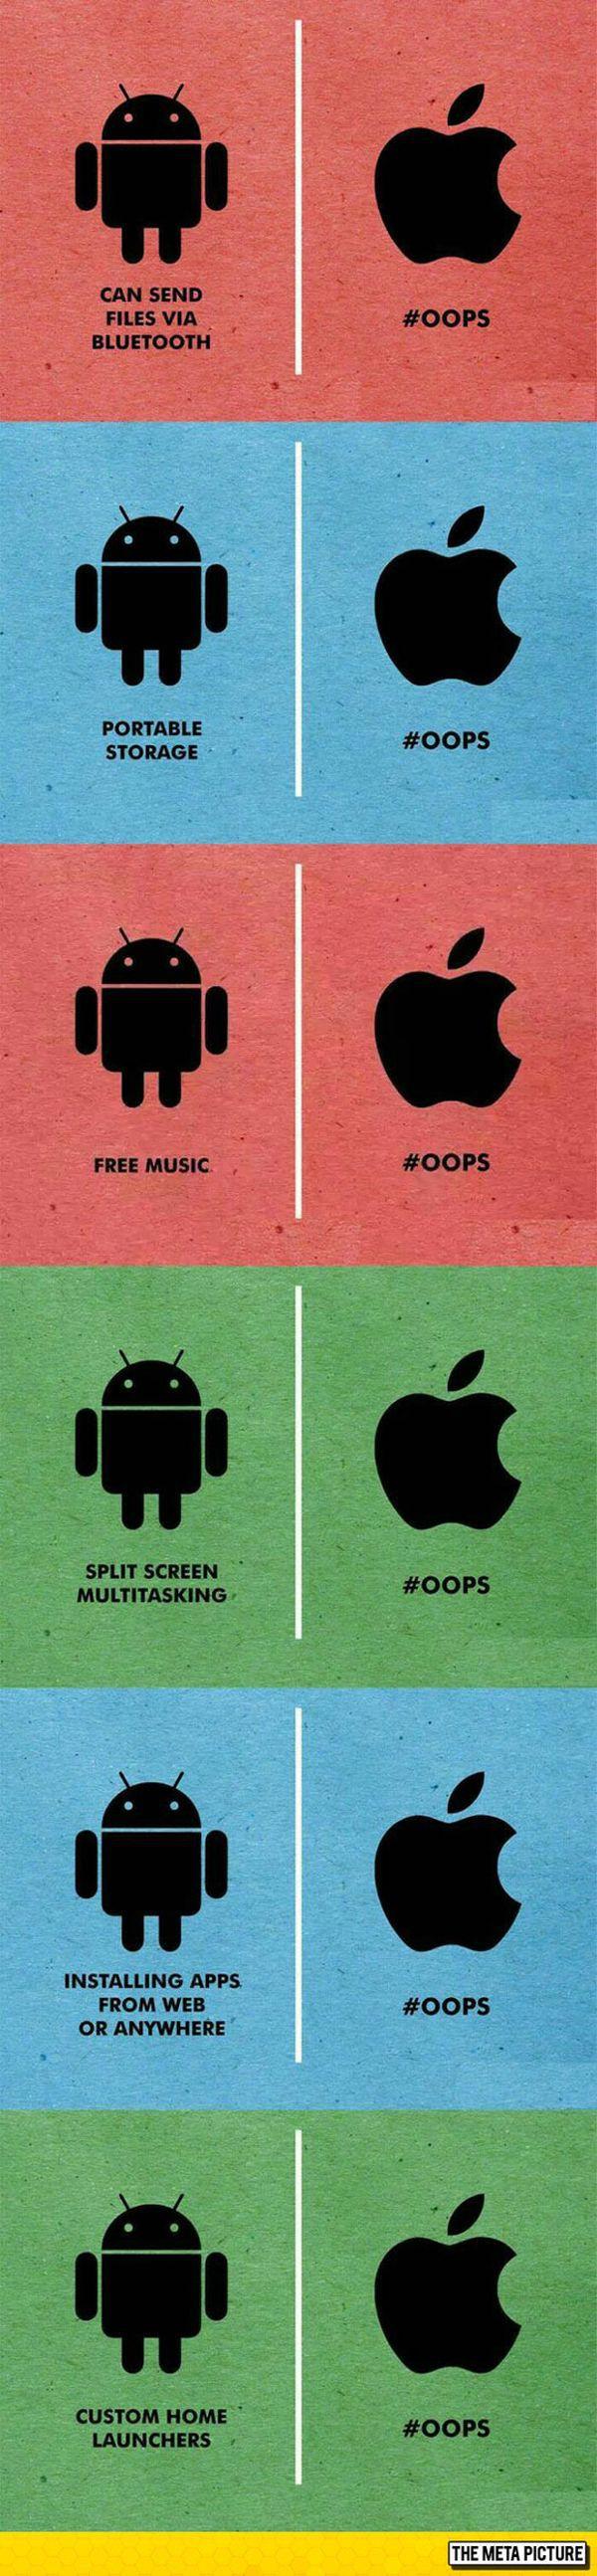 Iphone Vs Samsung Spongebob Meme